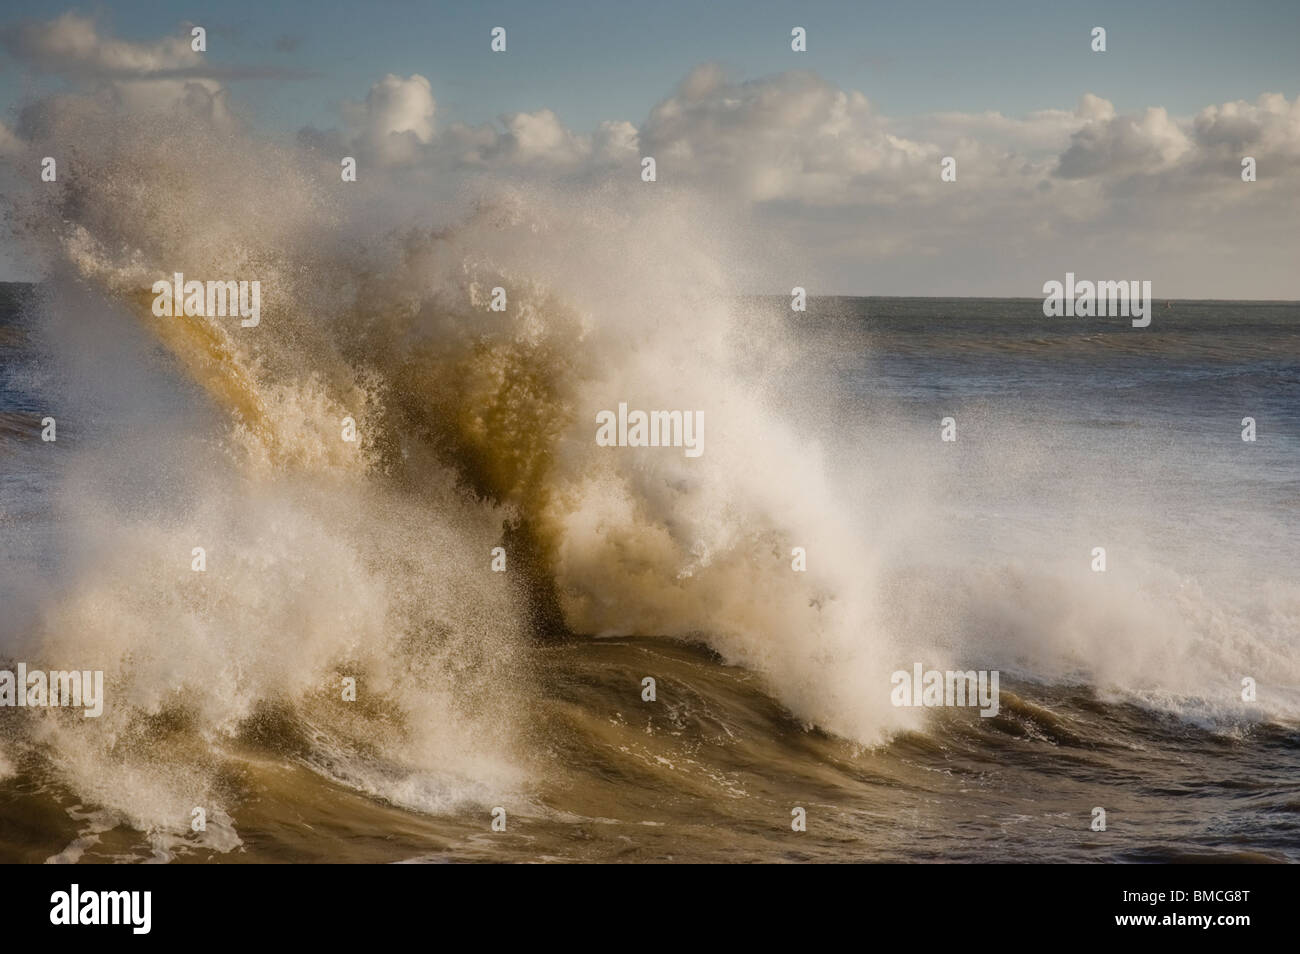 El mar embravecido en Bridlington East Yorkshire Foto de stock